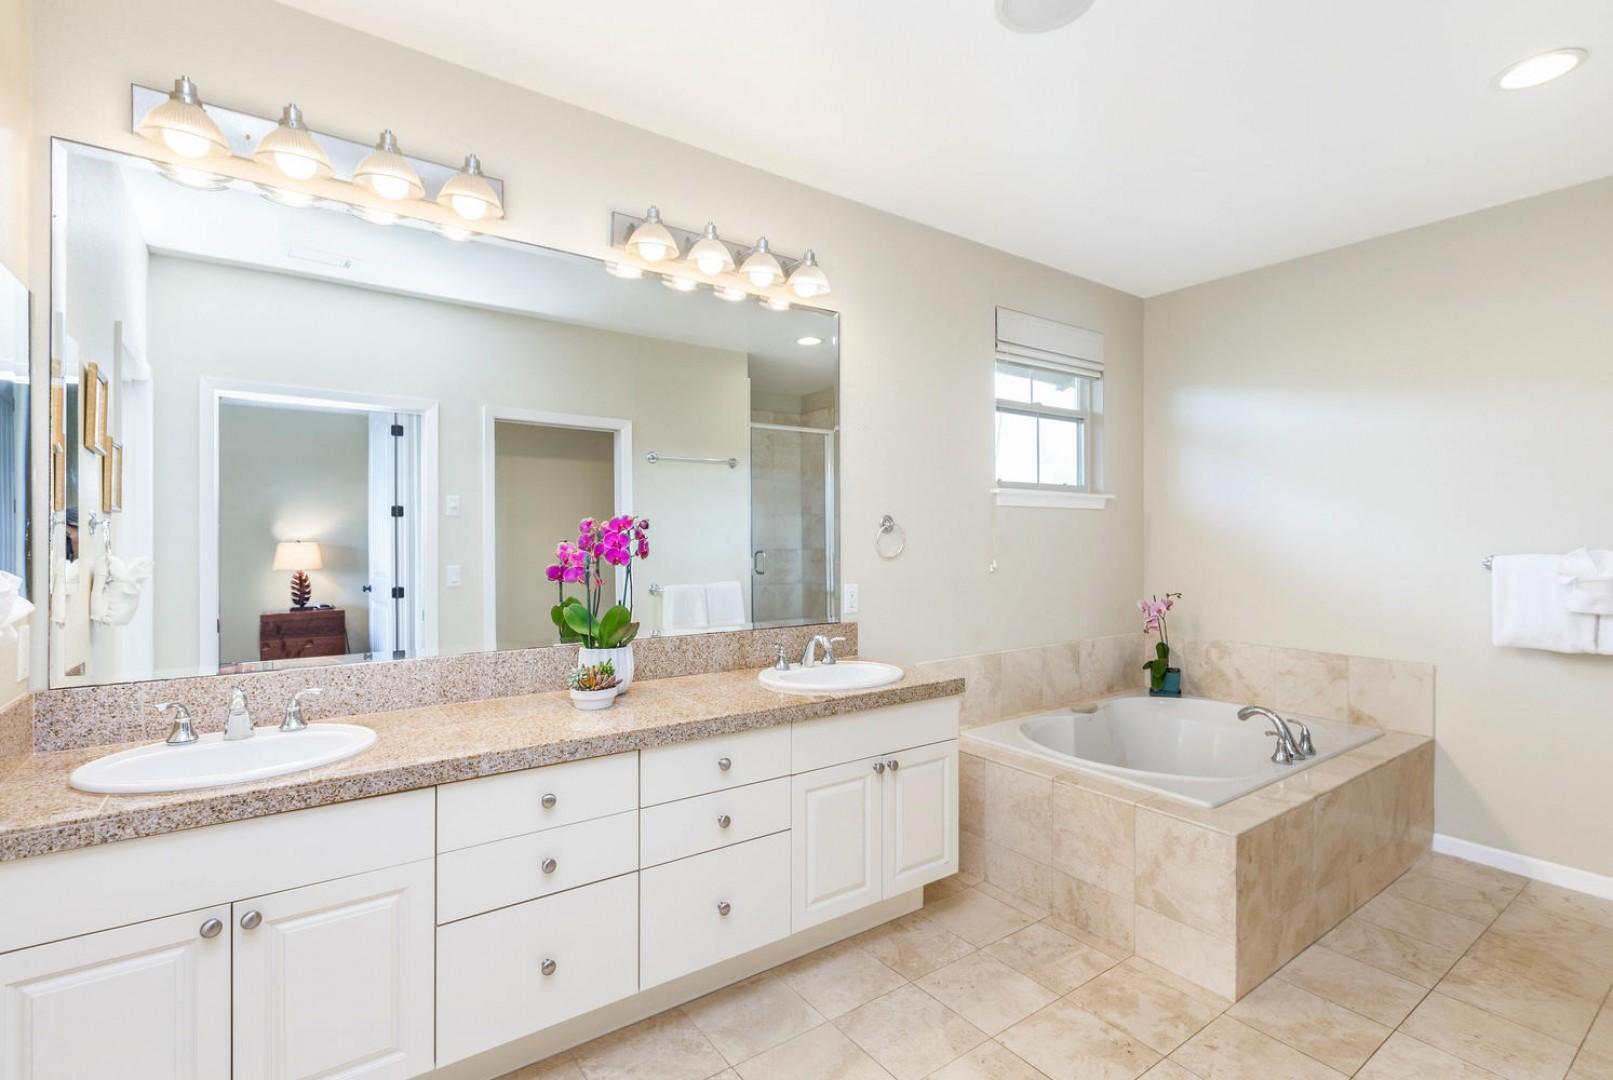 Master Bathroom with Double Vanity Sinks